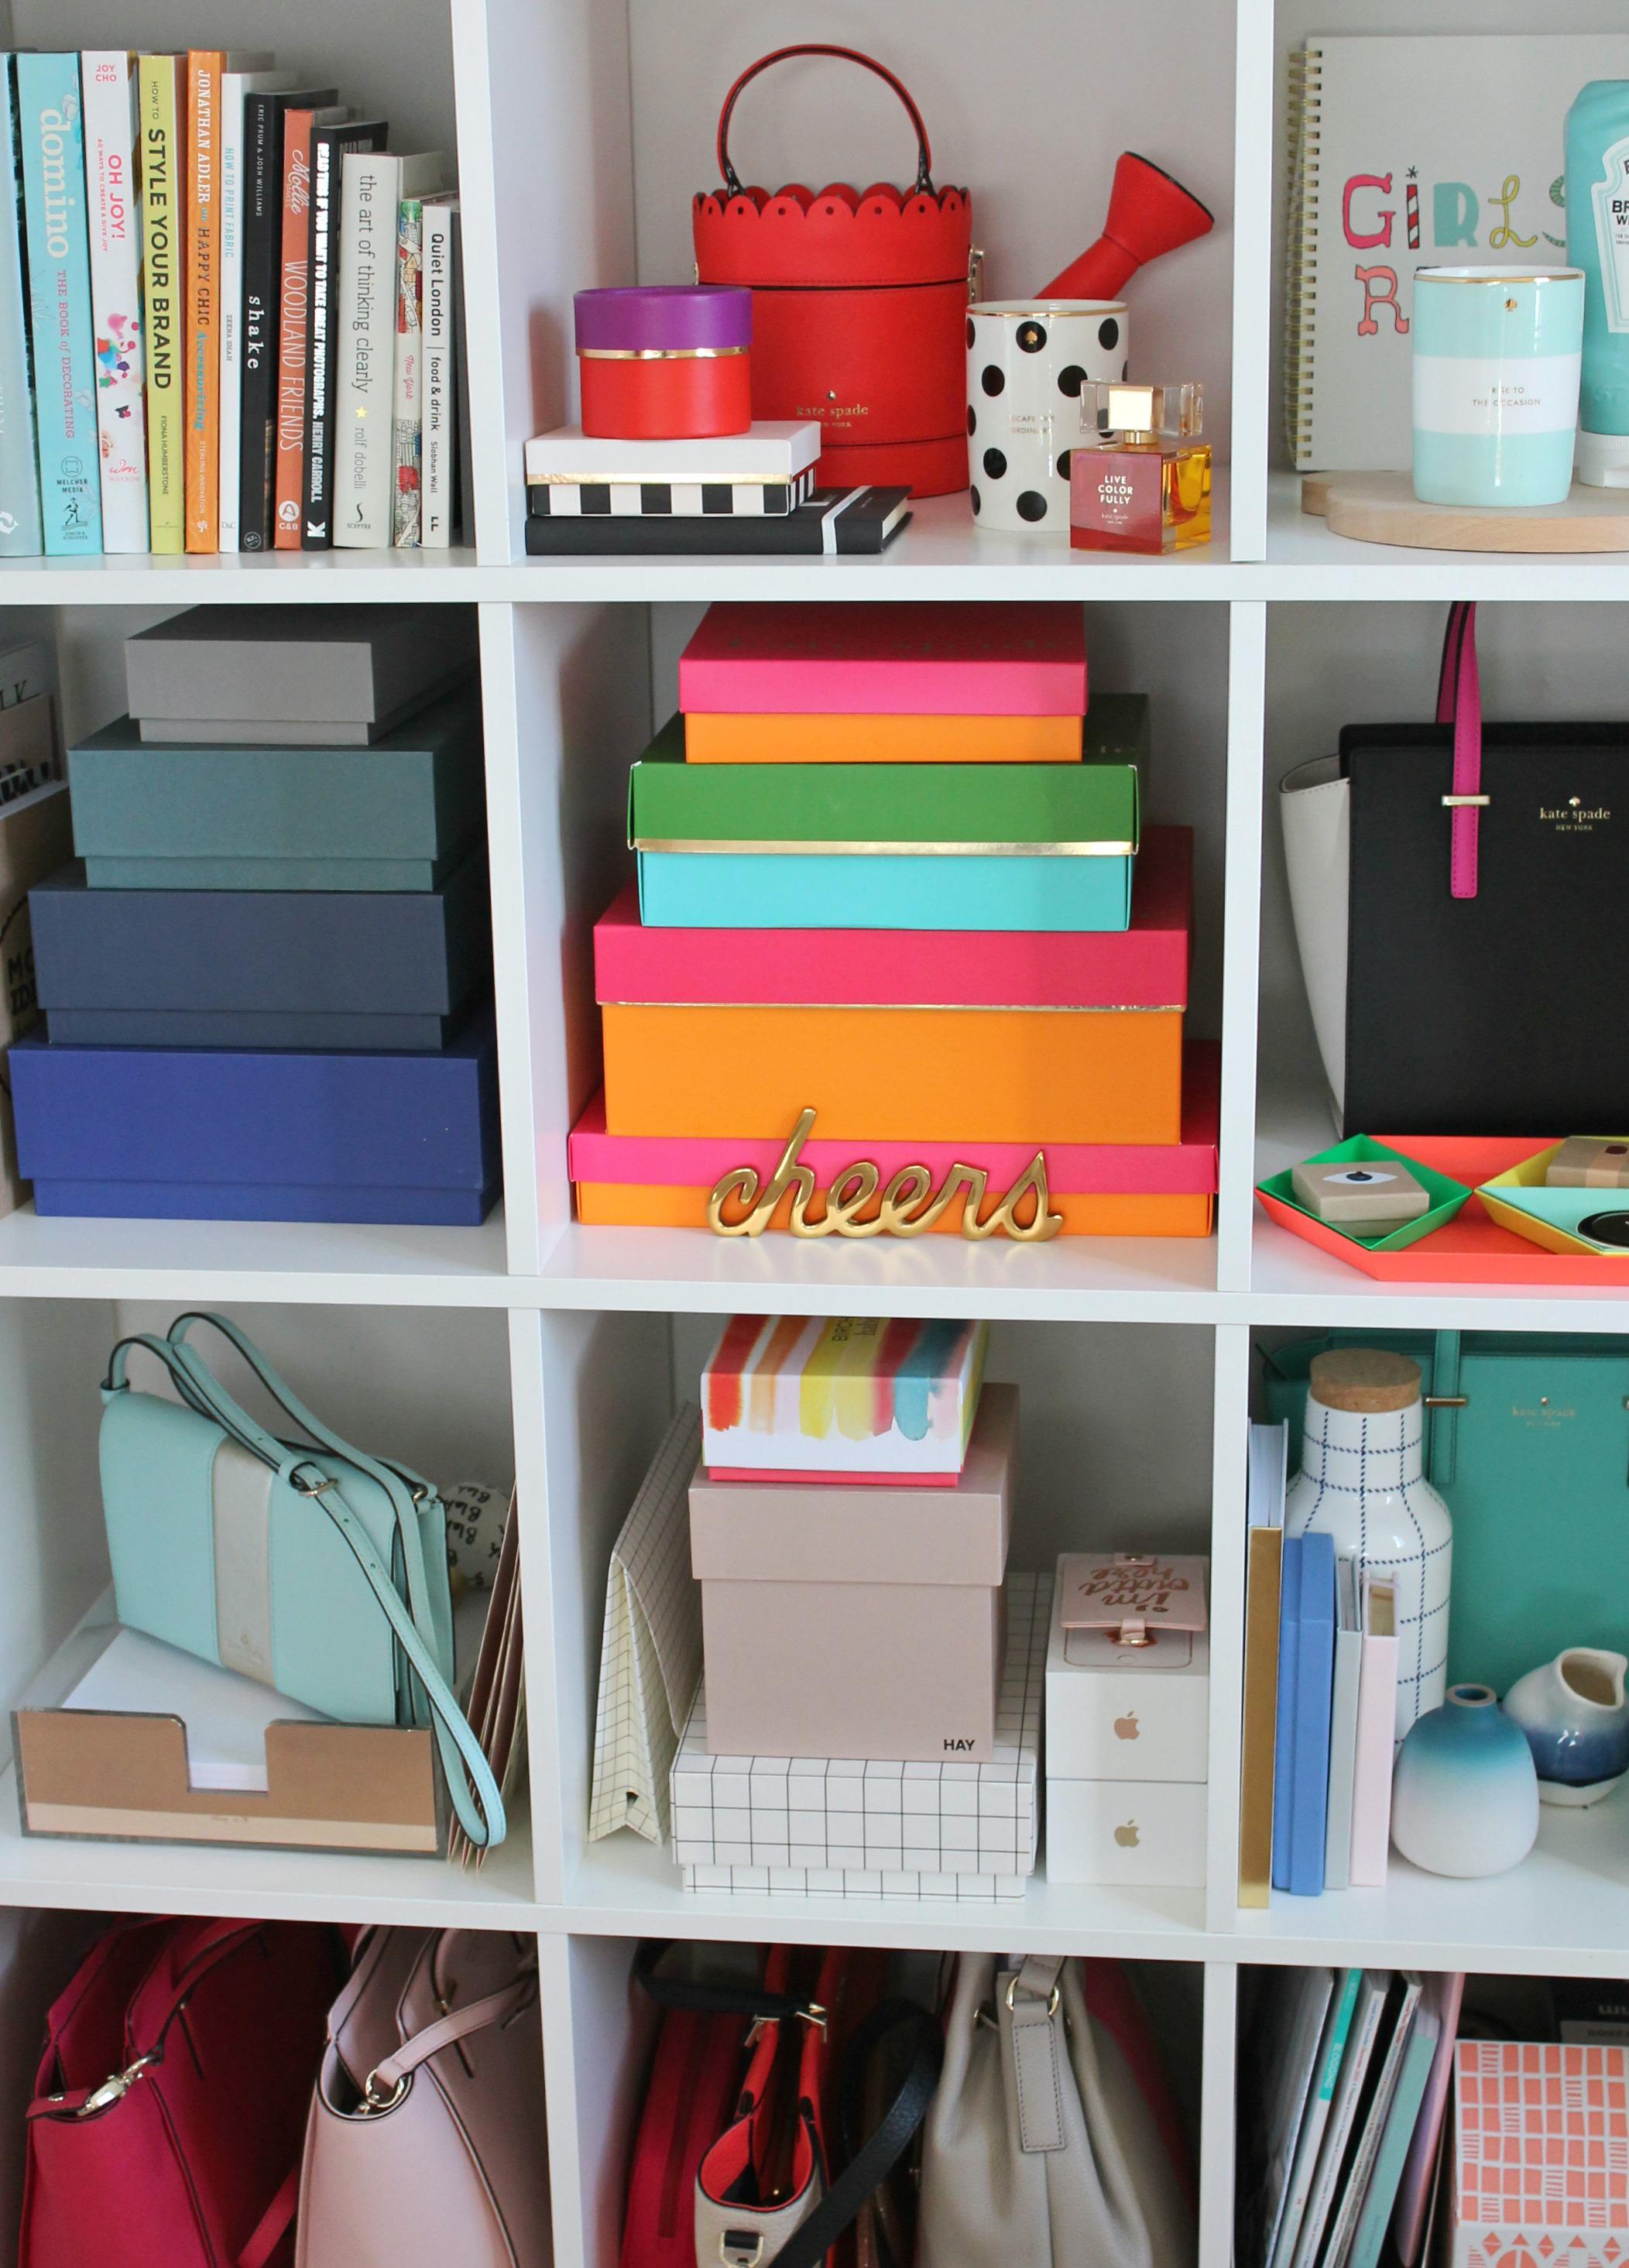 Colourful-shelf-at-home-Geraldine-Tan-Little-Big-Bell